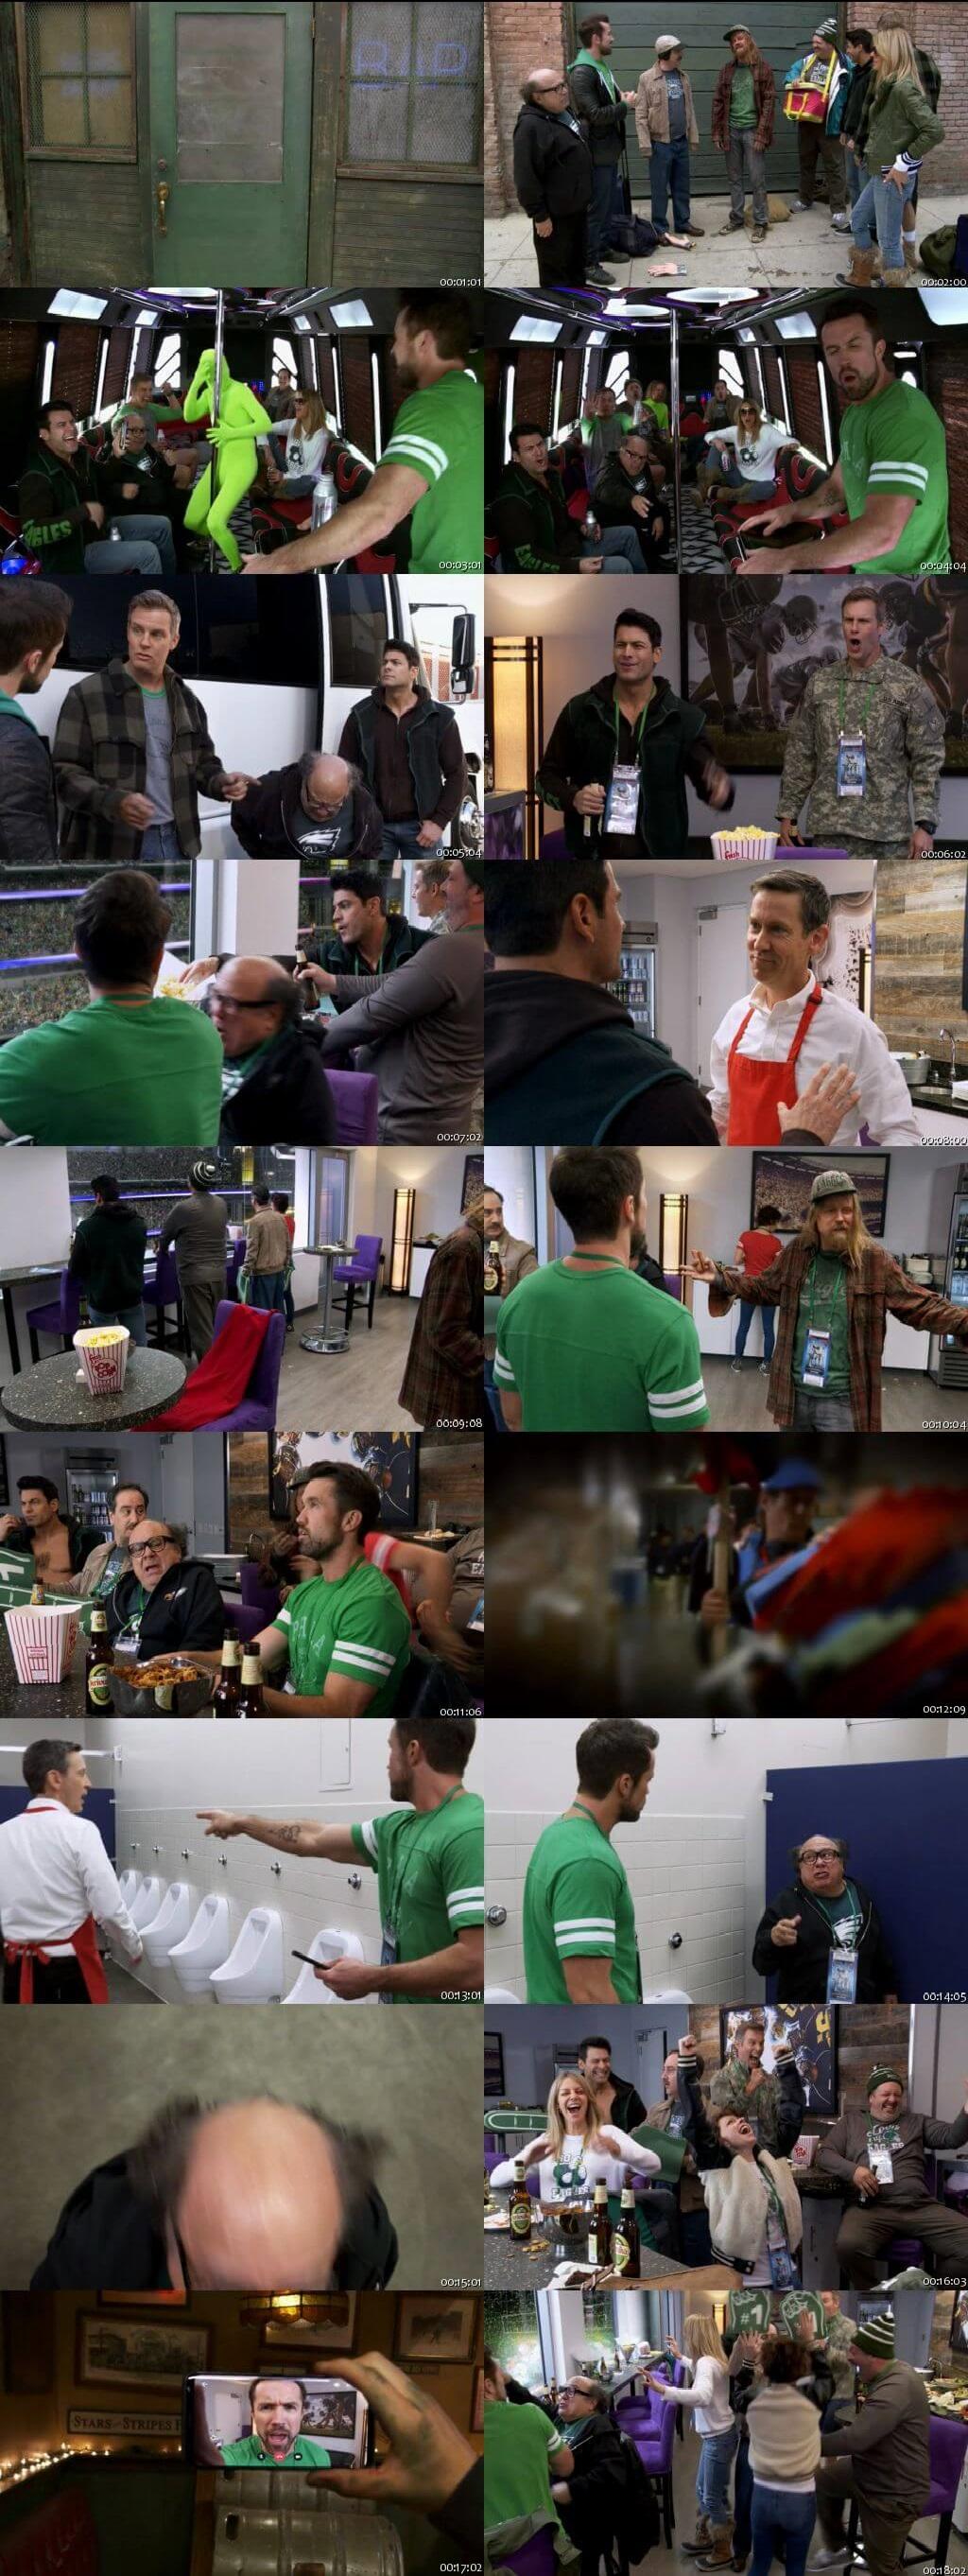 Screenshots Of English Show Its Always Sunny in Philadelphia Season 13 Episode 09 2018 WEB-DL 720P 300MB